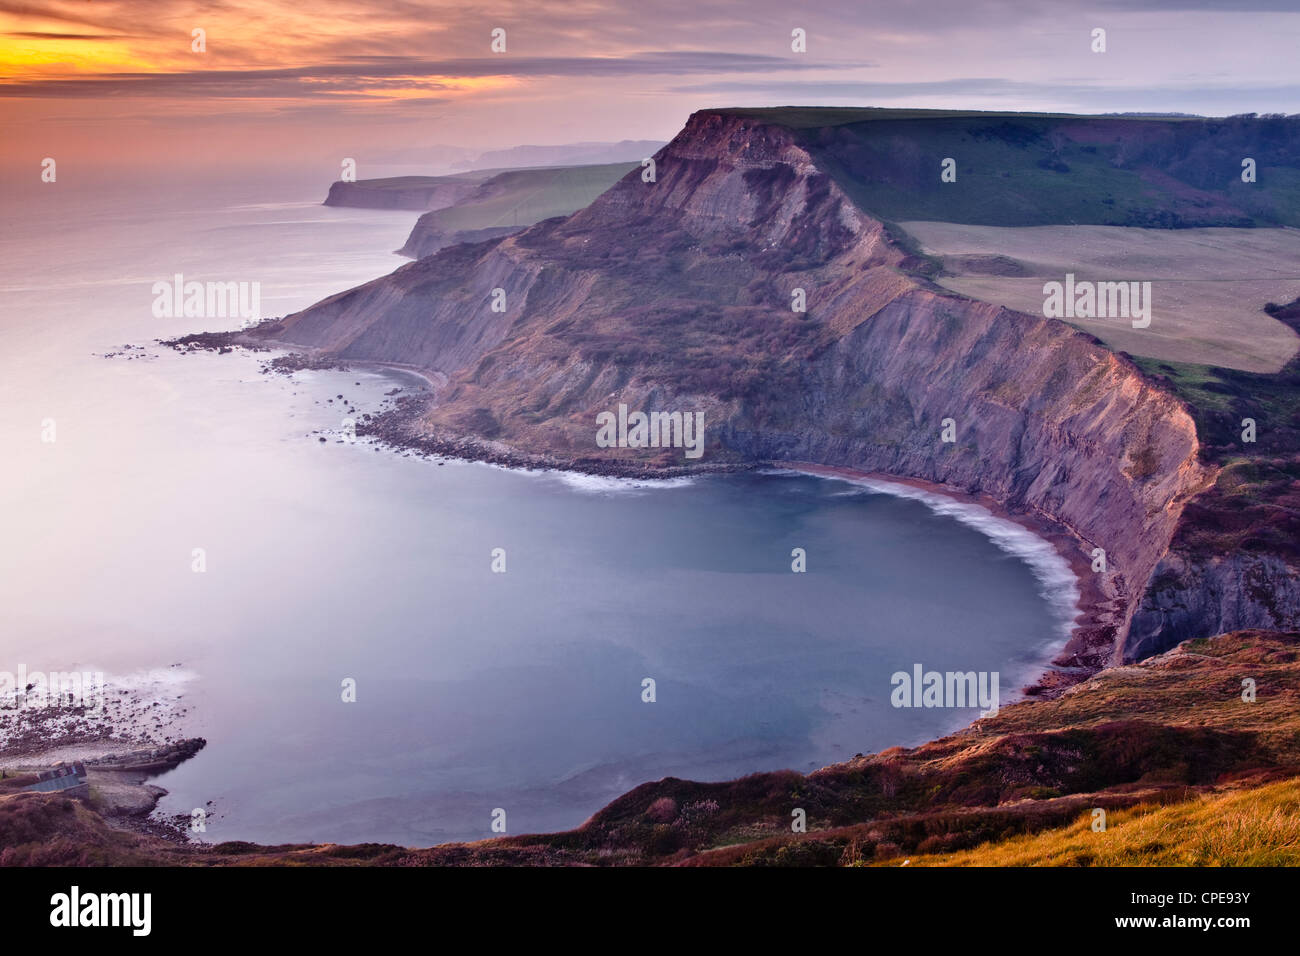 A beautiful sunset over Chapman's Pool on Dorset's Jurassic Coast, Dorset, England, United Kingdom, Europe - Stock Image